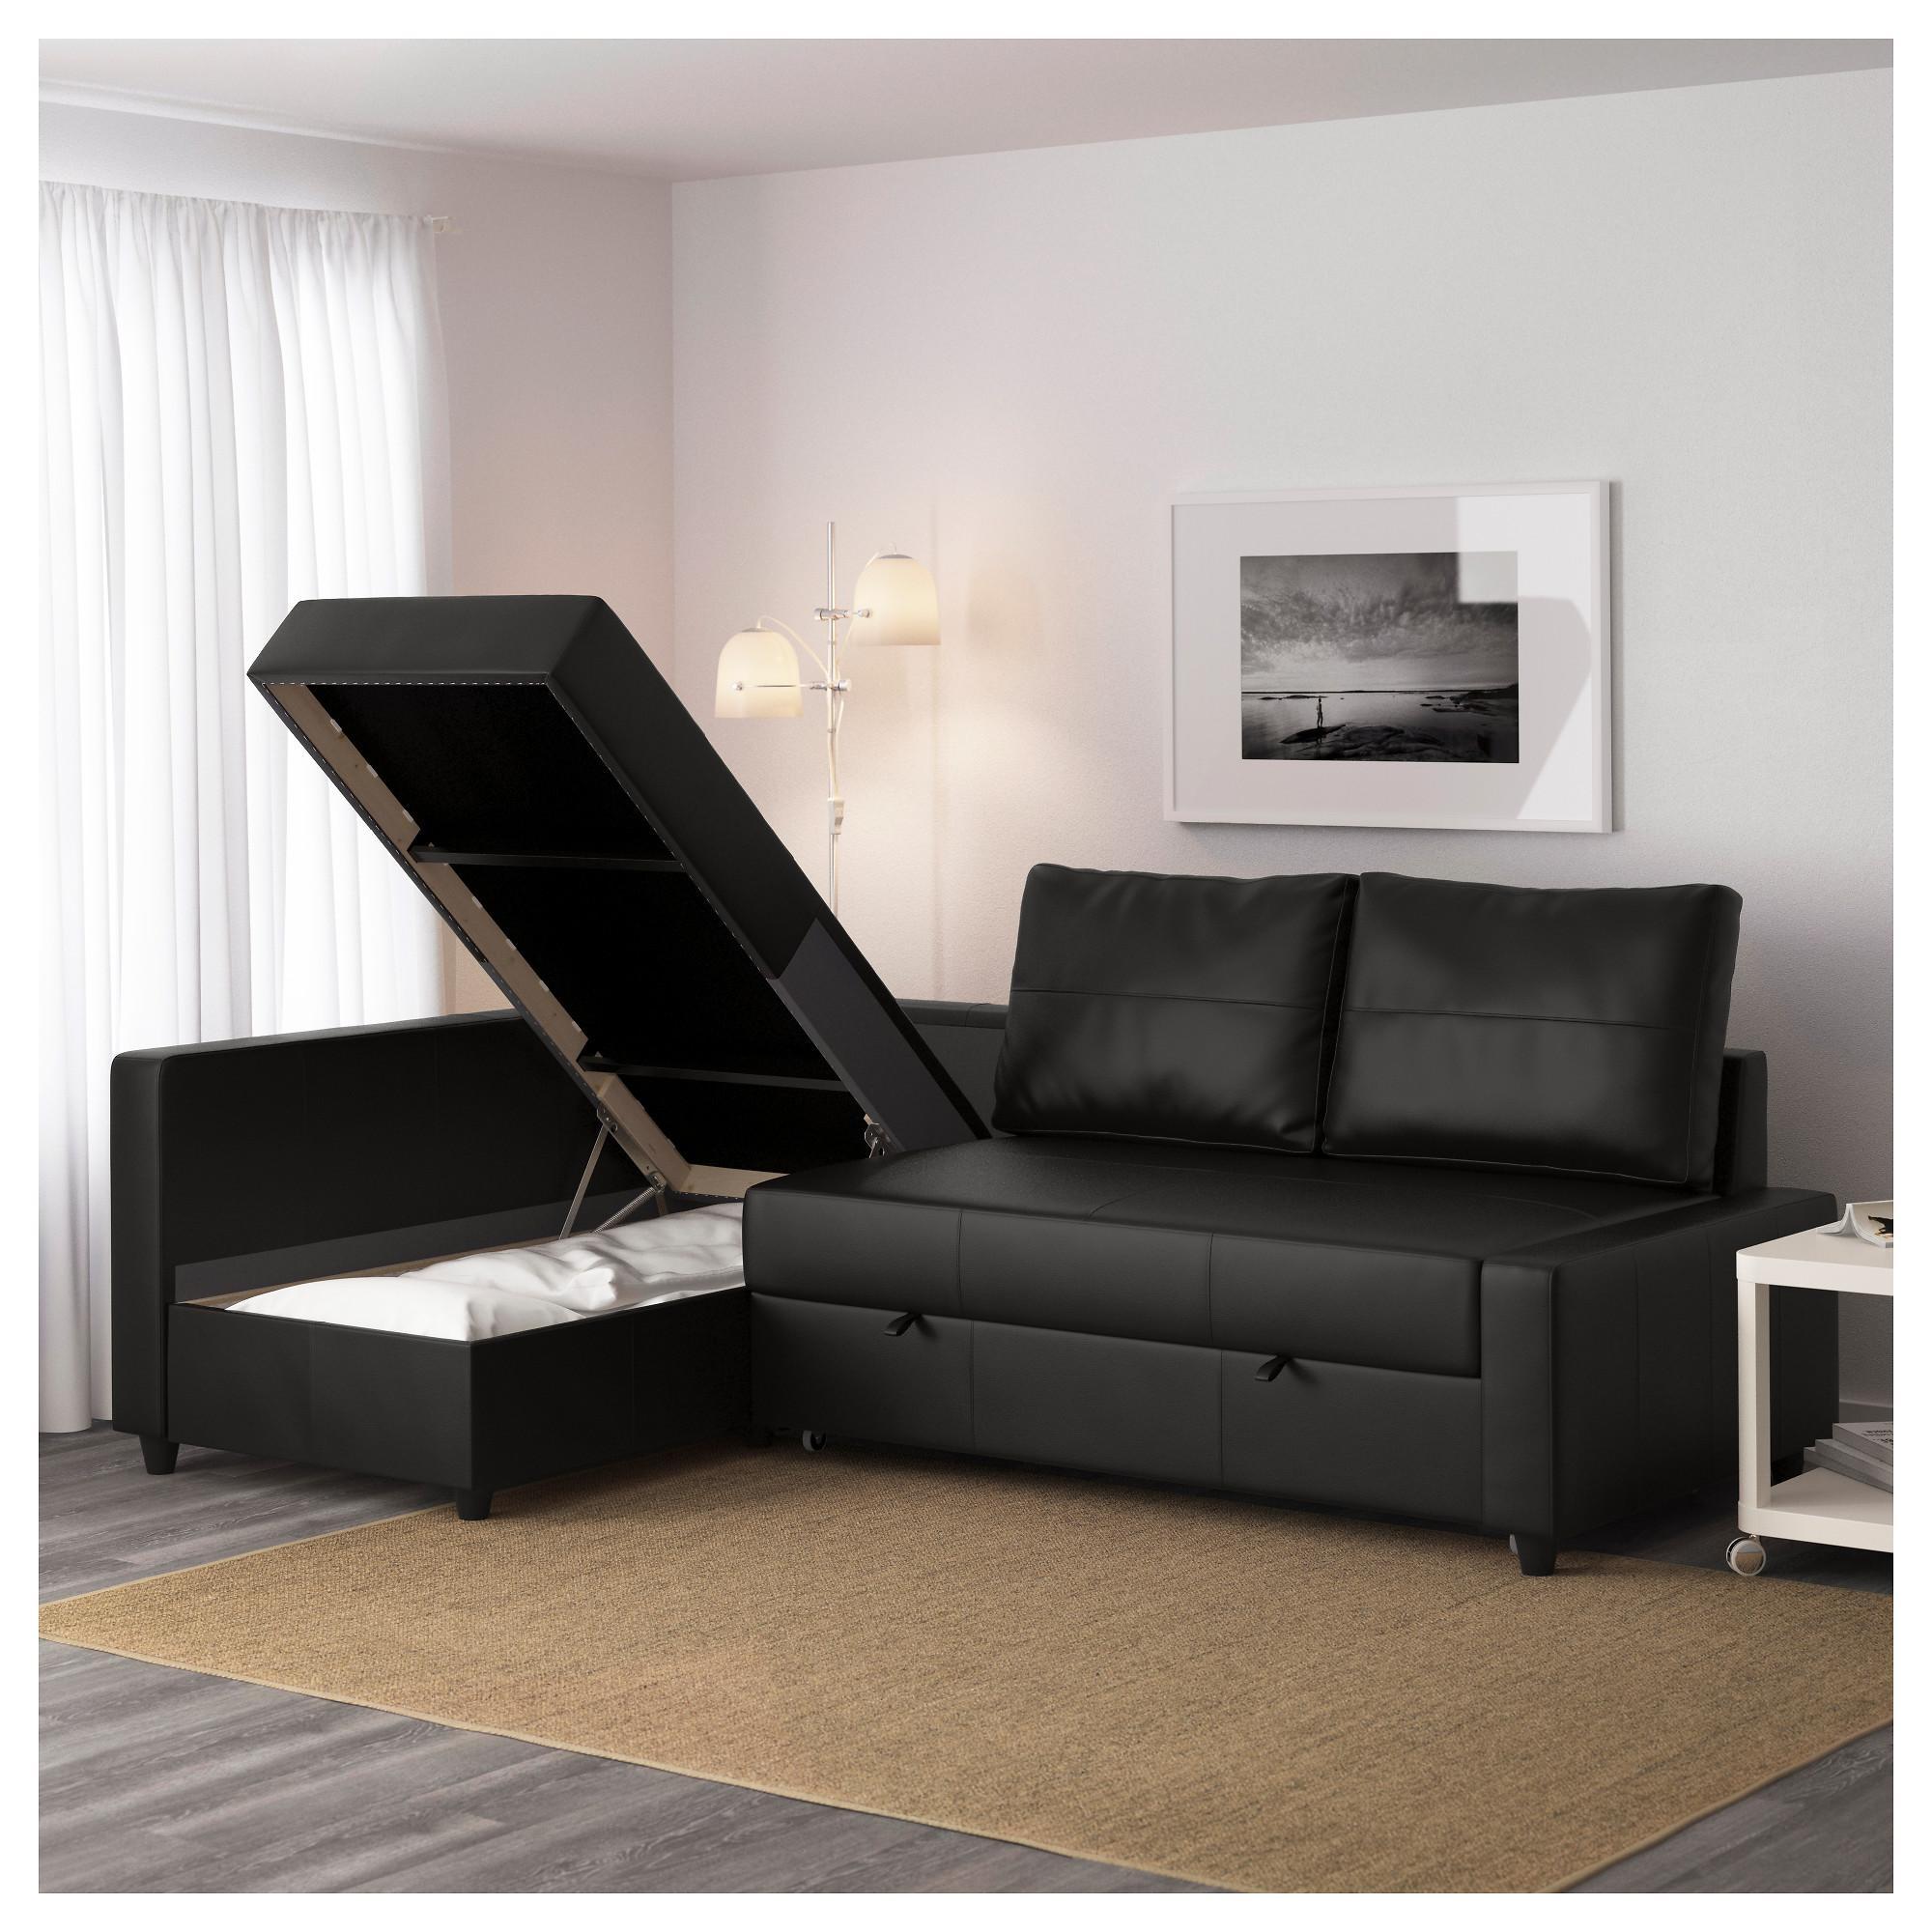 Friheten Sleeper Sectional,3 Seat W/storage – Skiftebo Dark Gray For Storage Sofas Ikea (View 3 of 20)